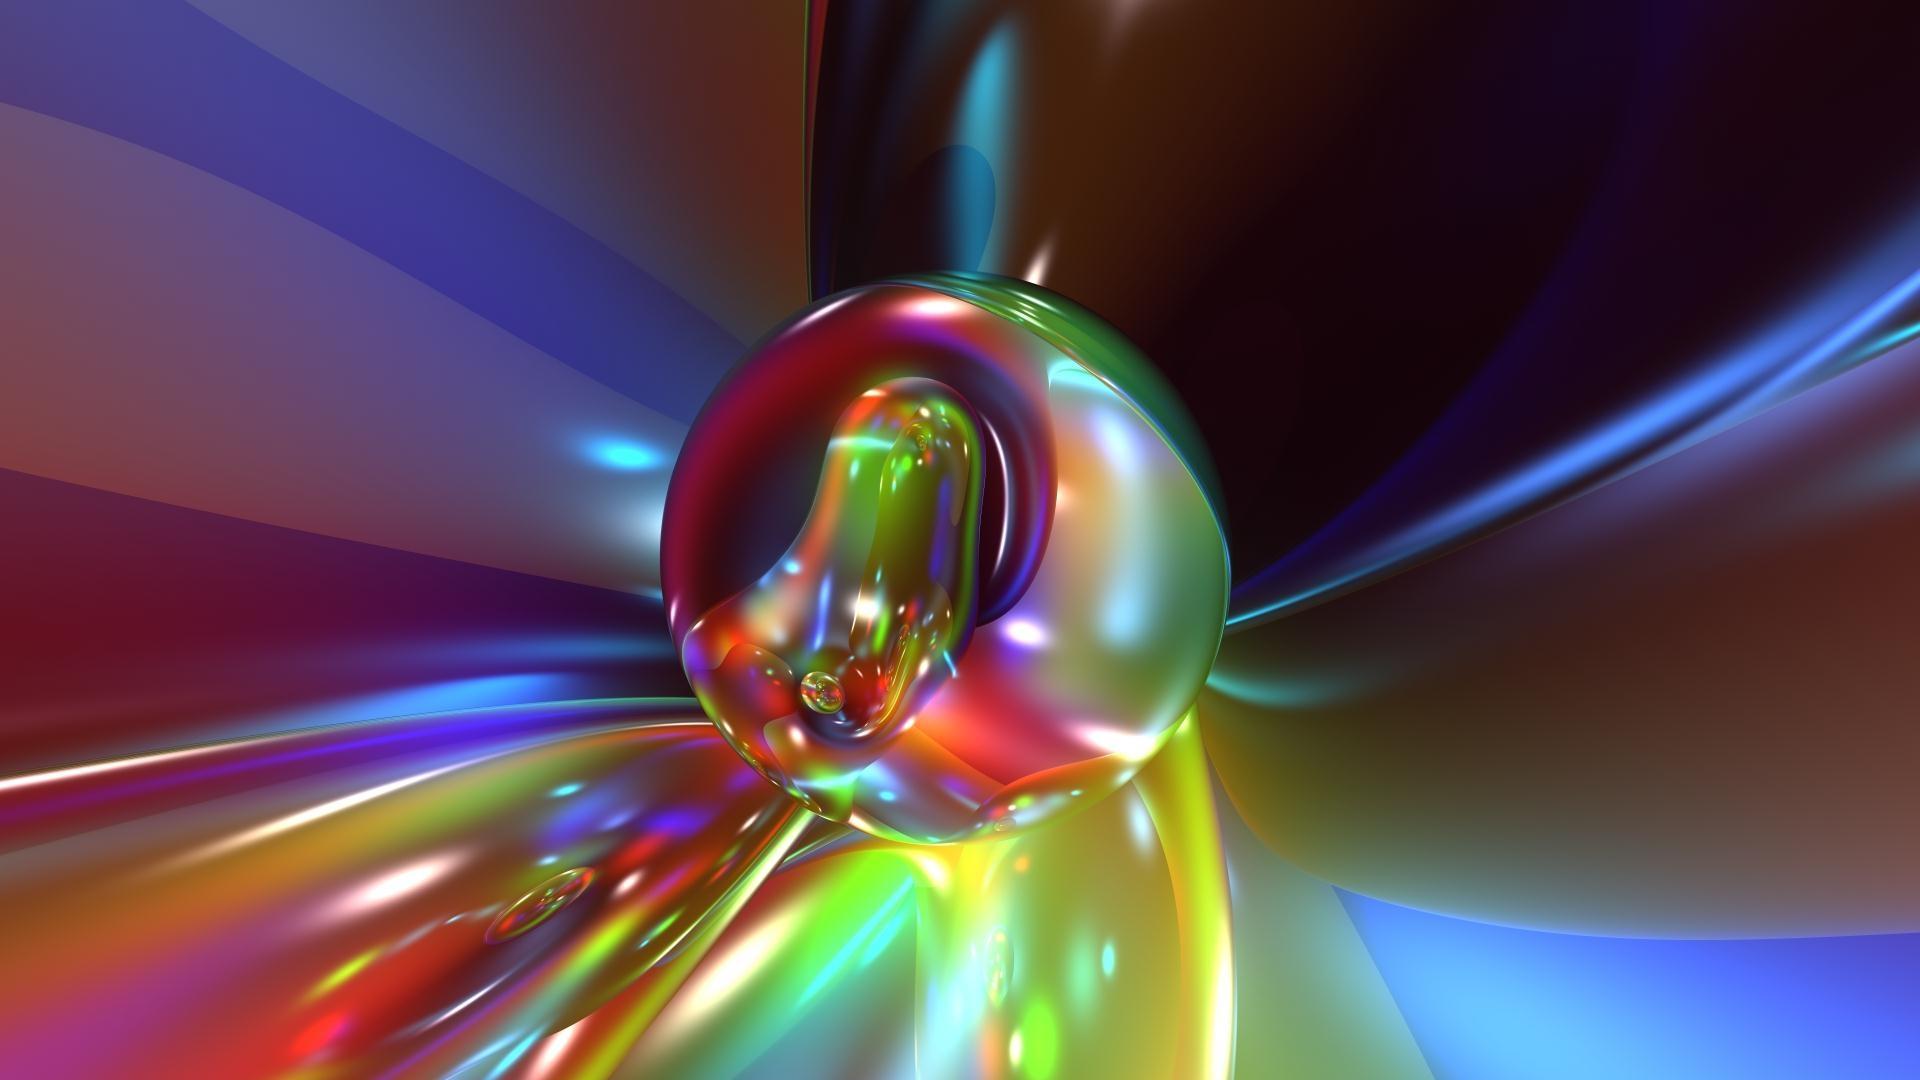 ball, glass, bright